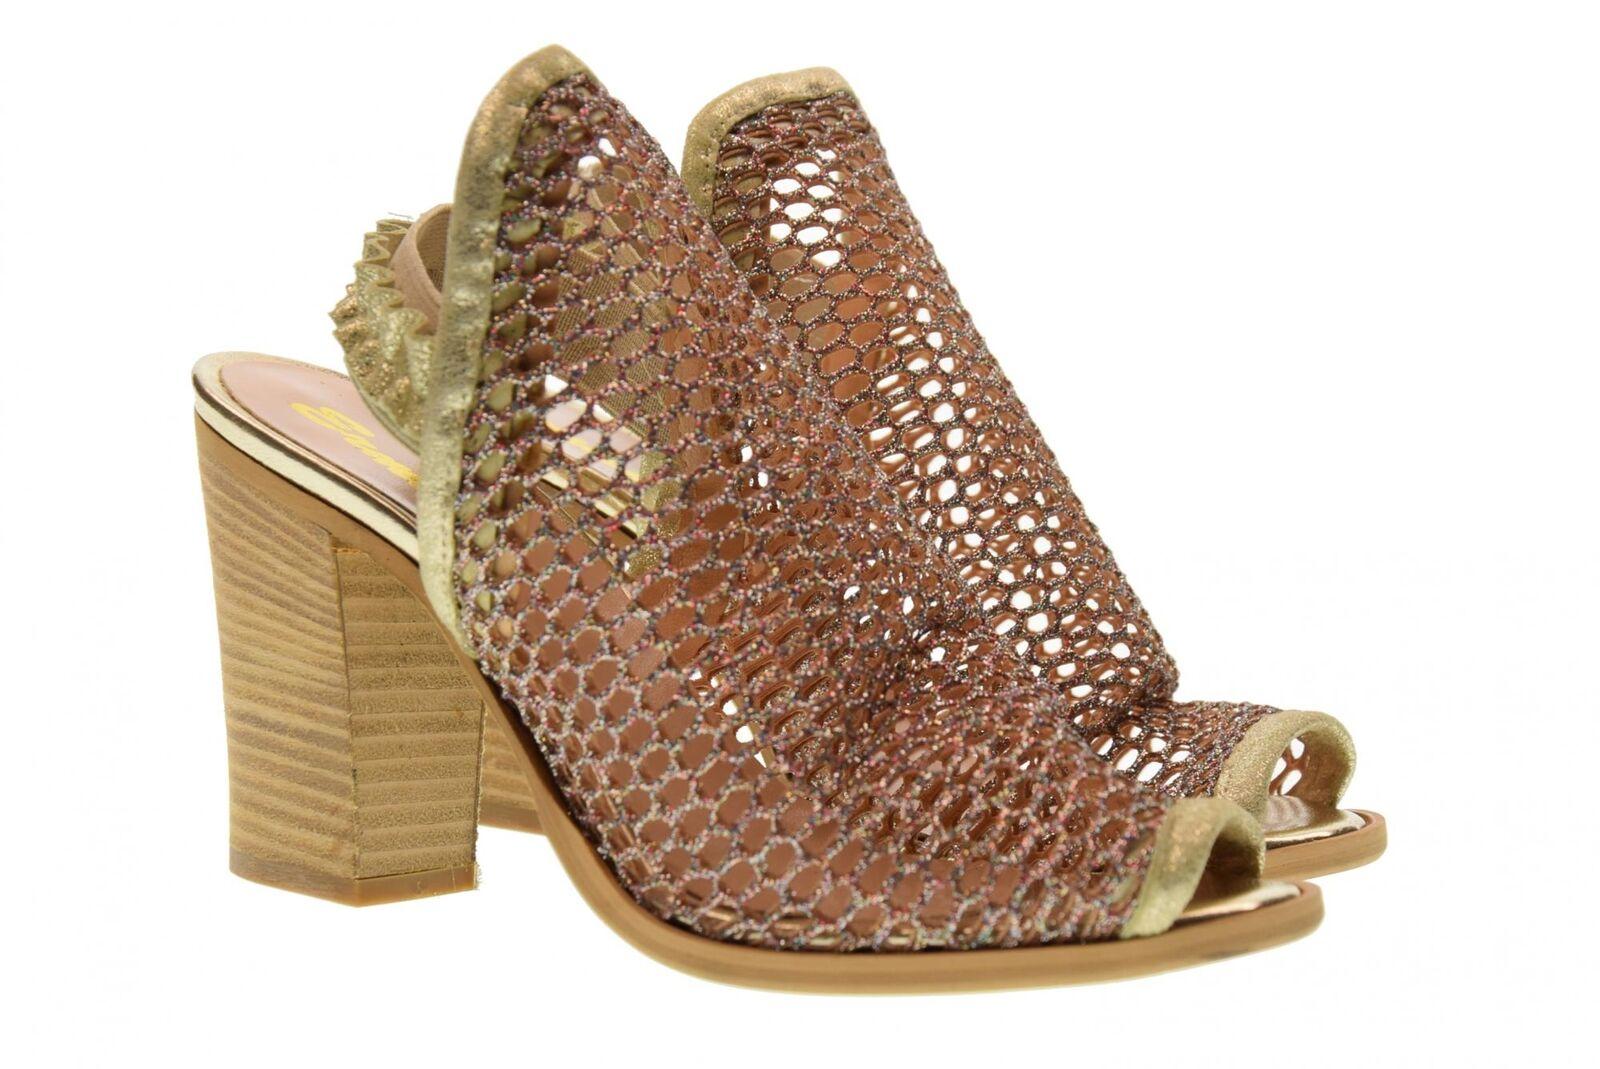 Erman's Frauen Sandale Schuhe 145 ORO P18g